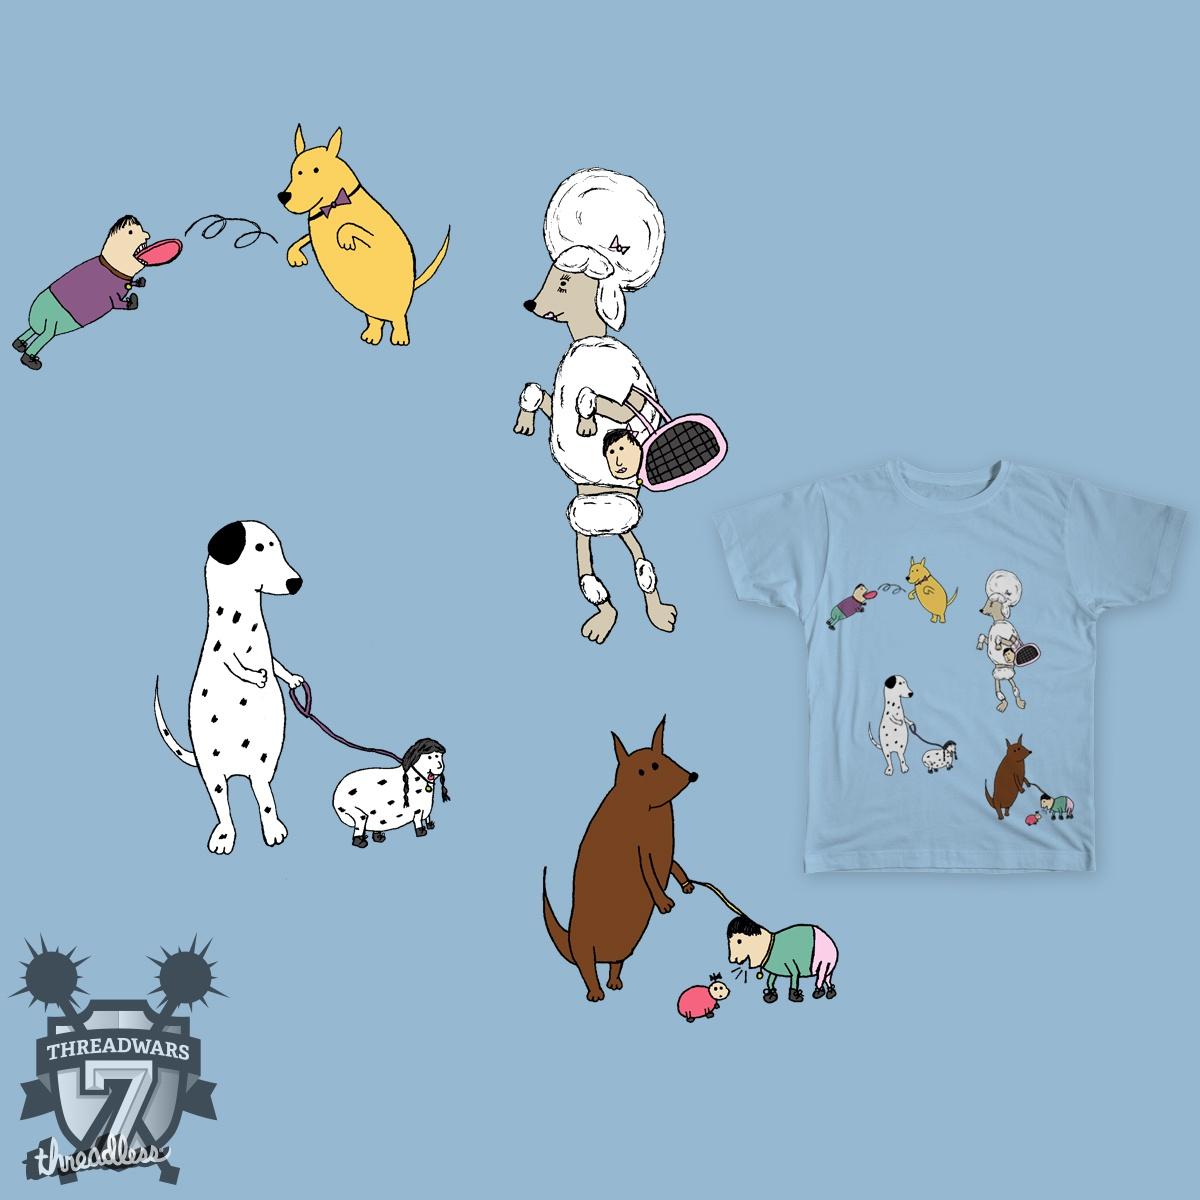 It's A Dog's World! by Christina.A.art on Threadless